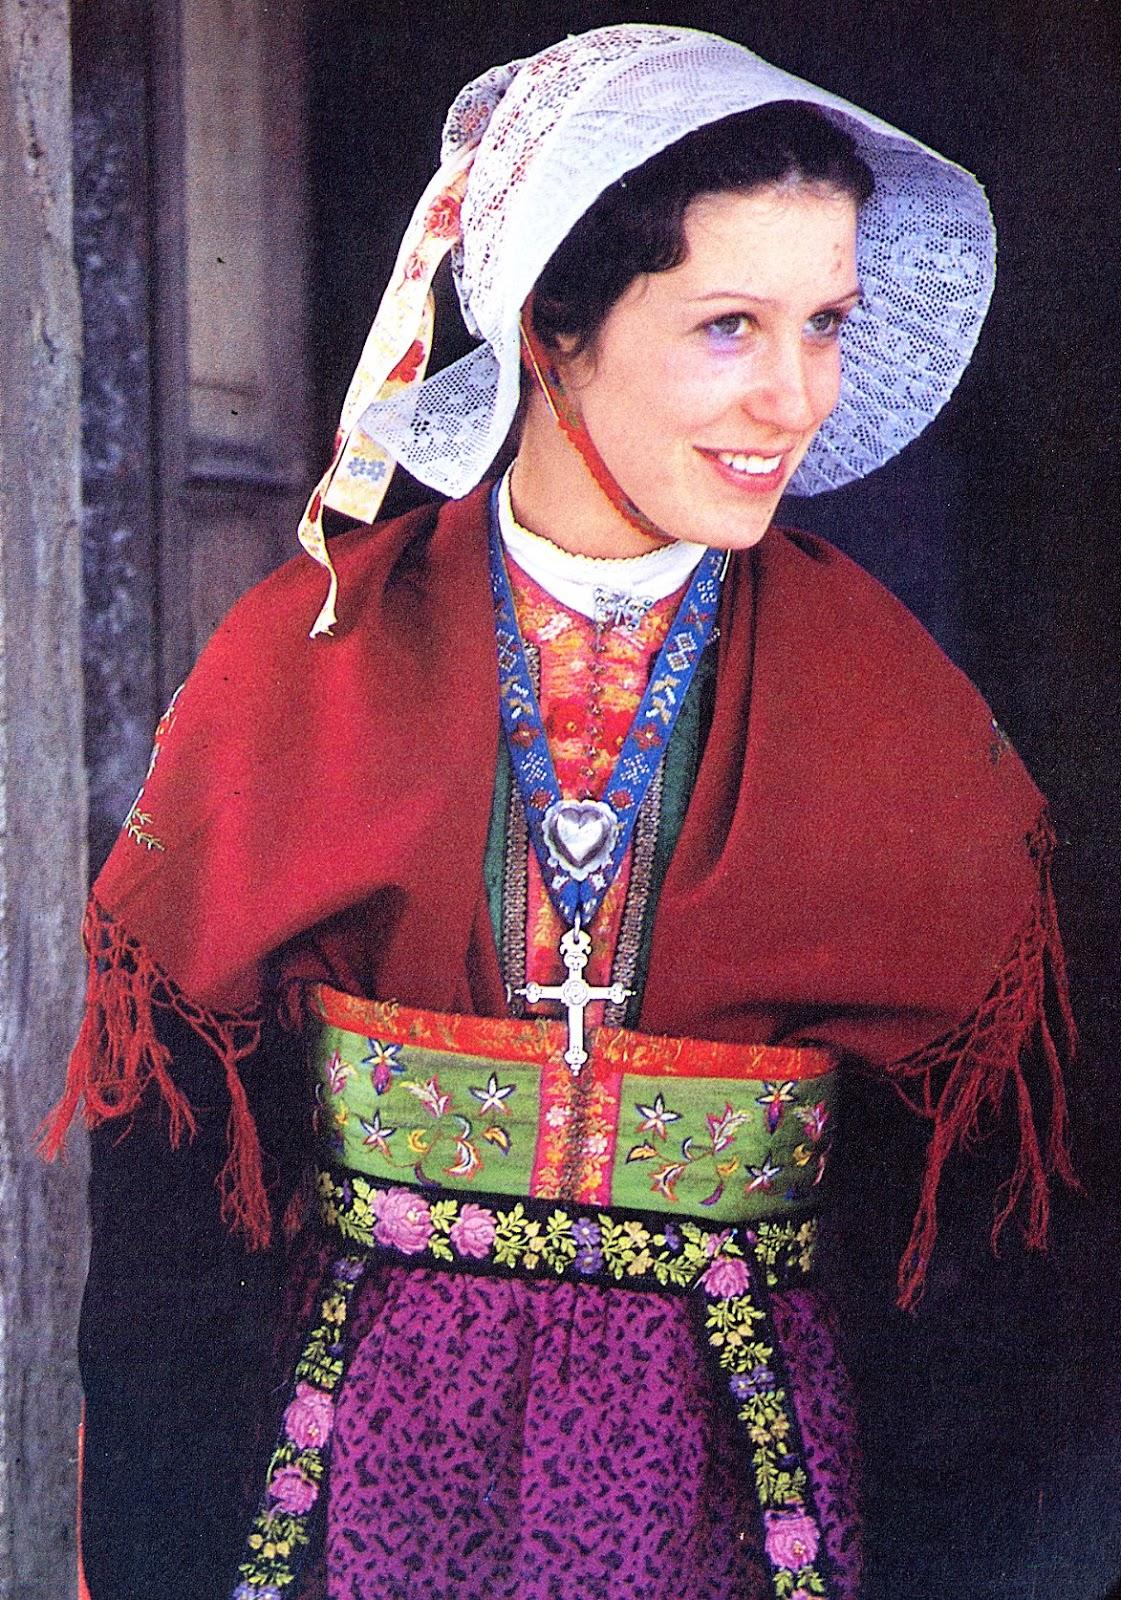 Folkcostume Amp Embroidery Costume Of The Arvan Valley Savoy